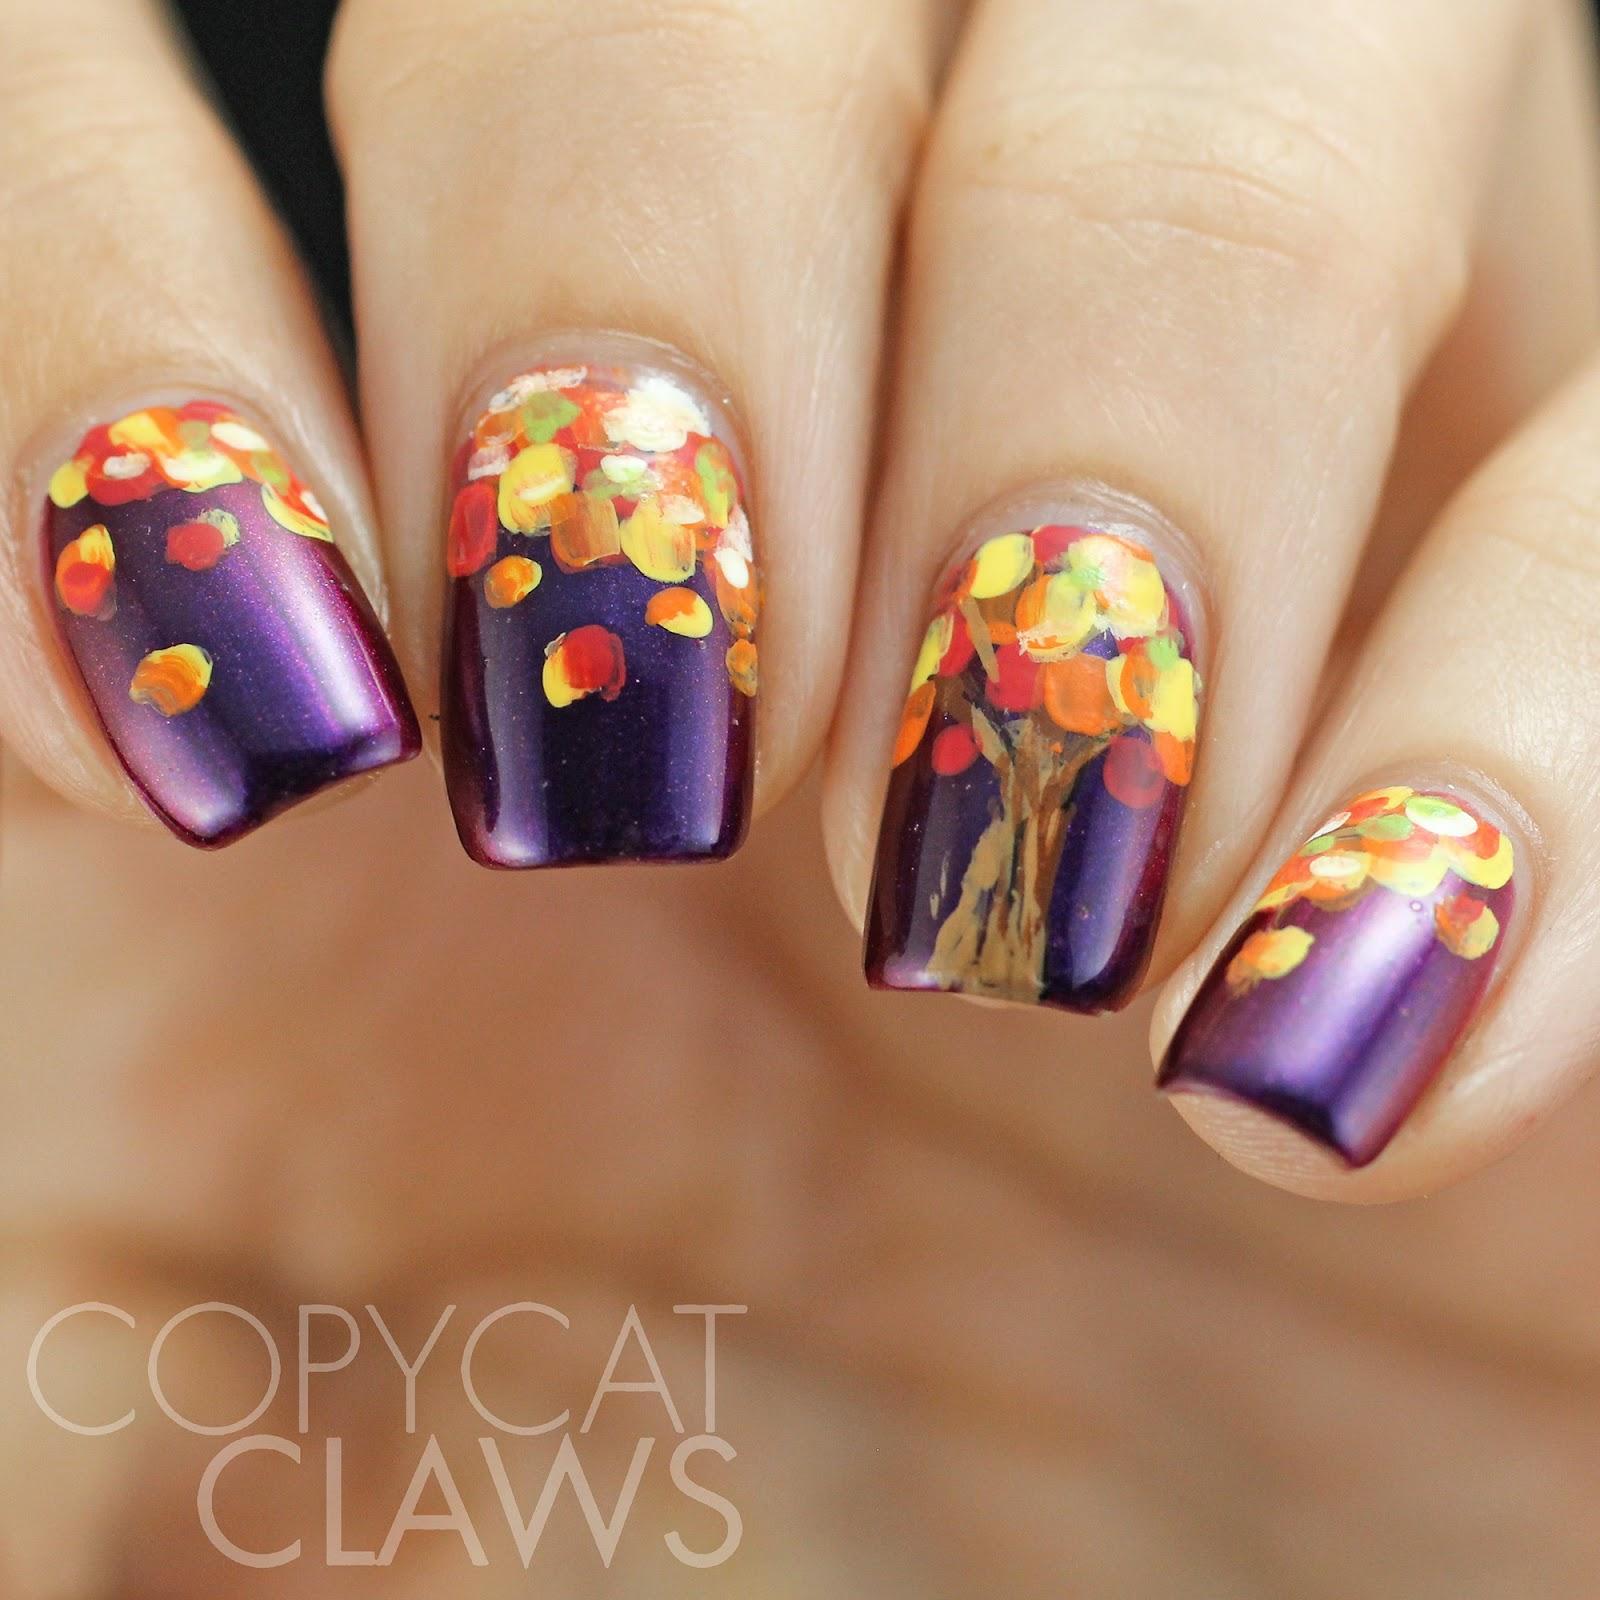 Copycat Claws: September 2015